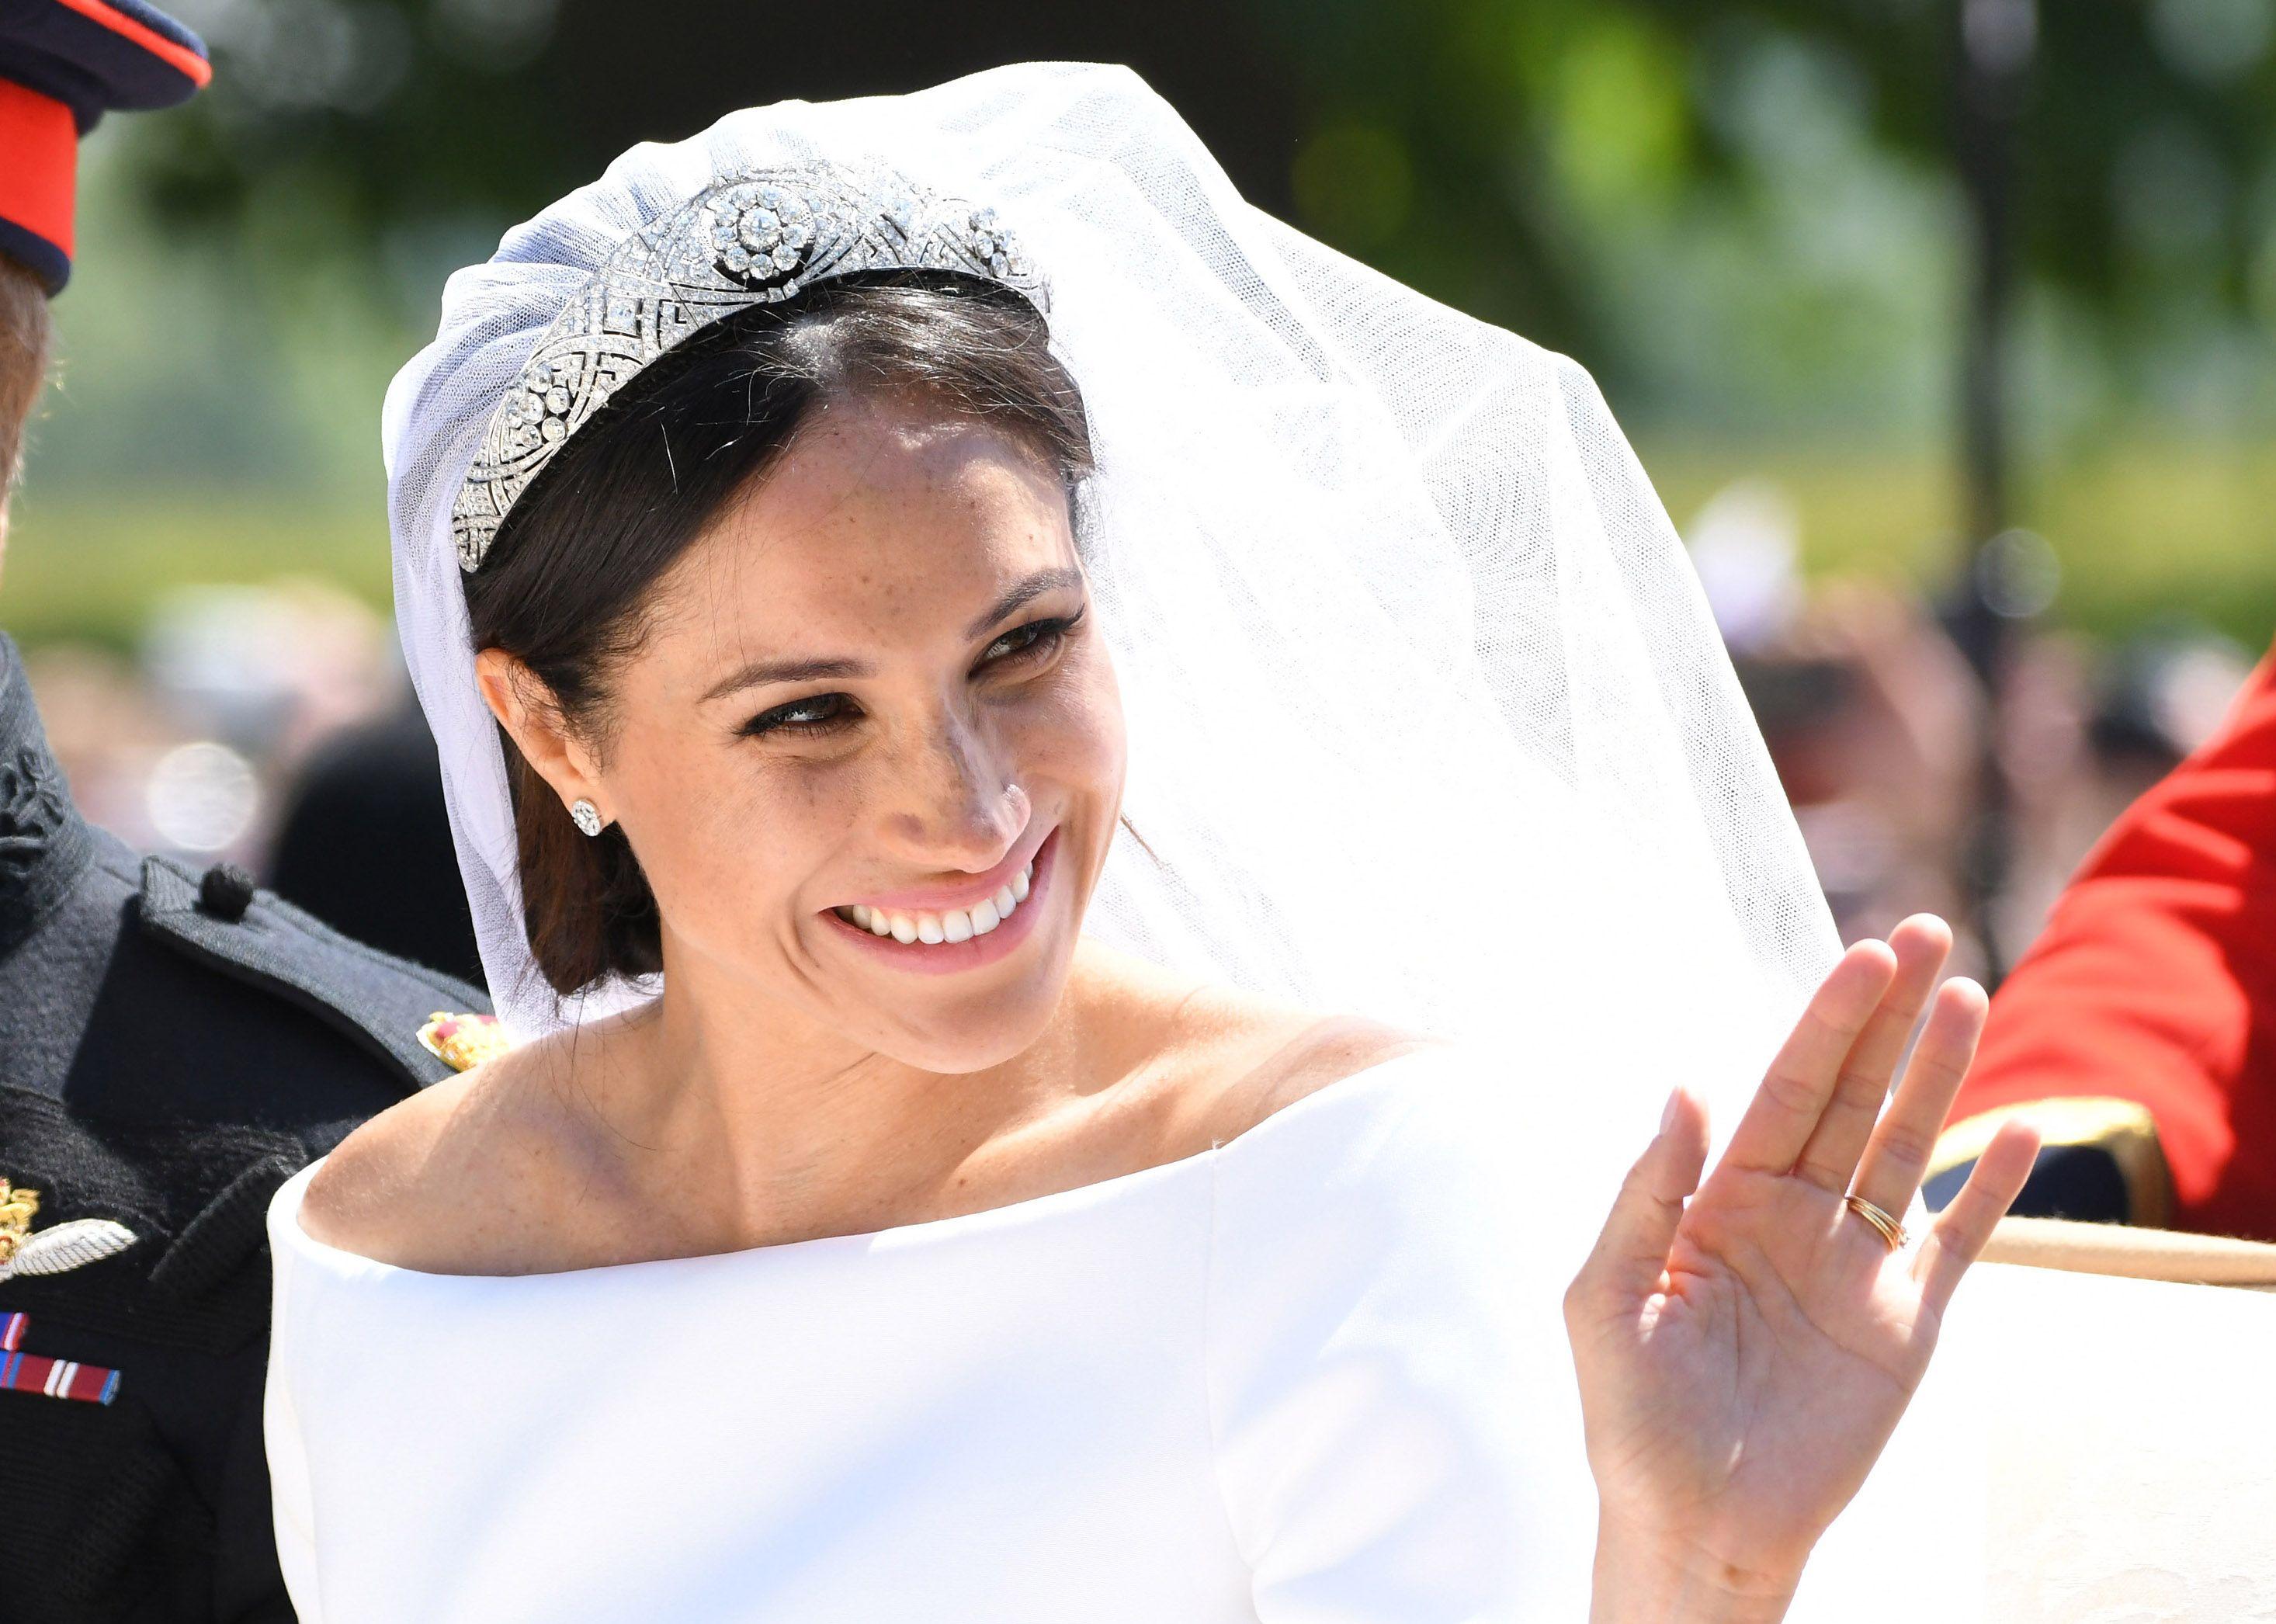 queen elizabeth meghan markle didn t disagree about her wedding tiara per finding freedom queen elizabeth meghan markle didn t